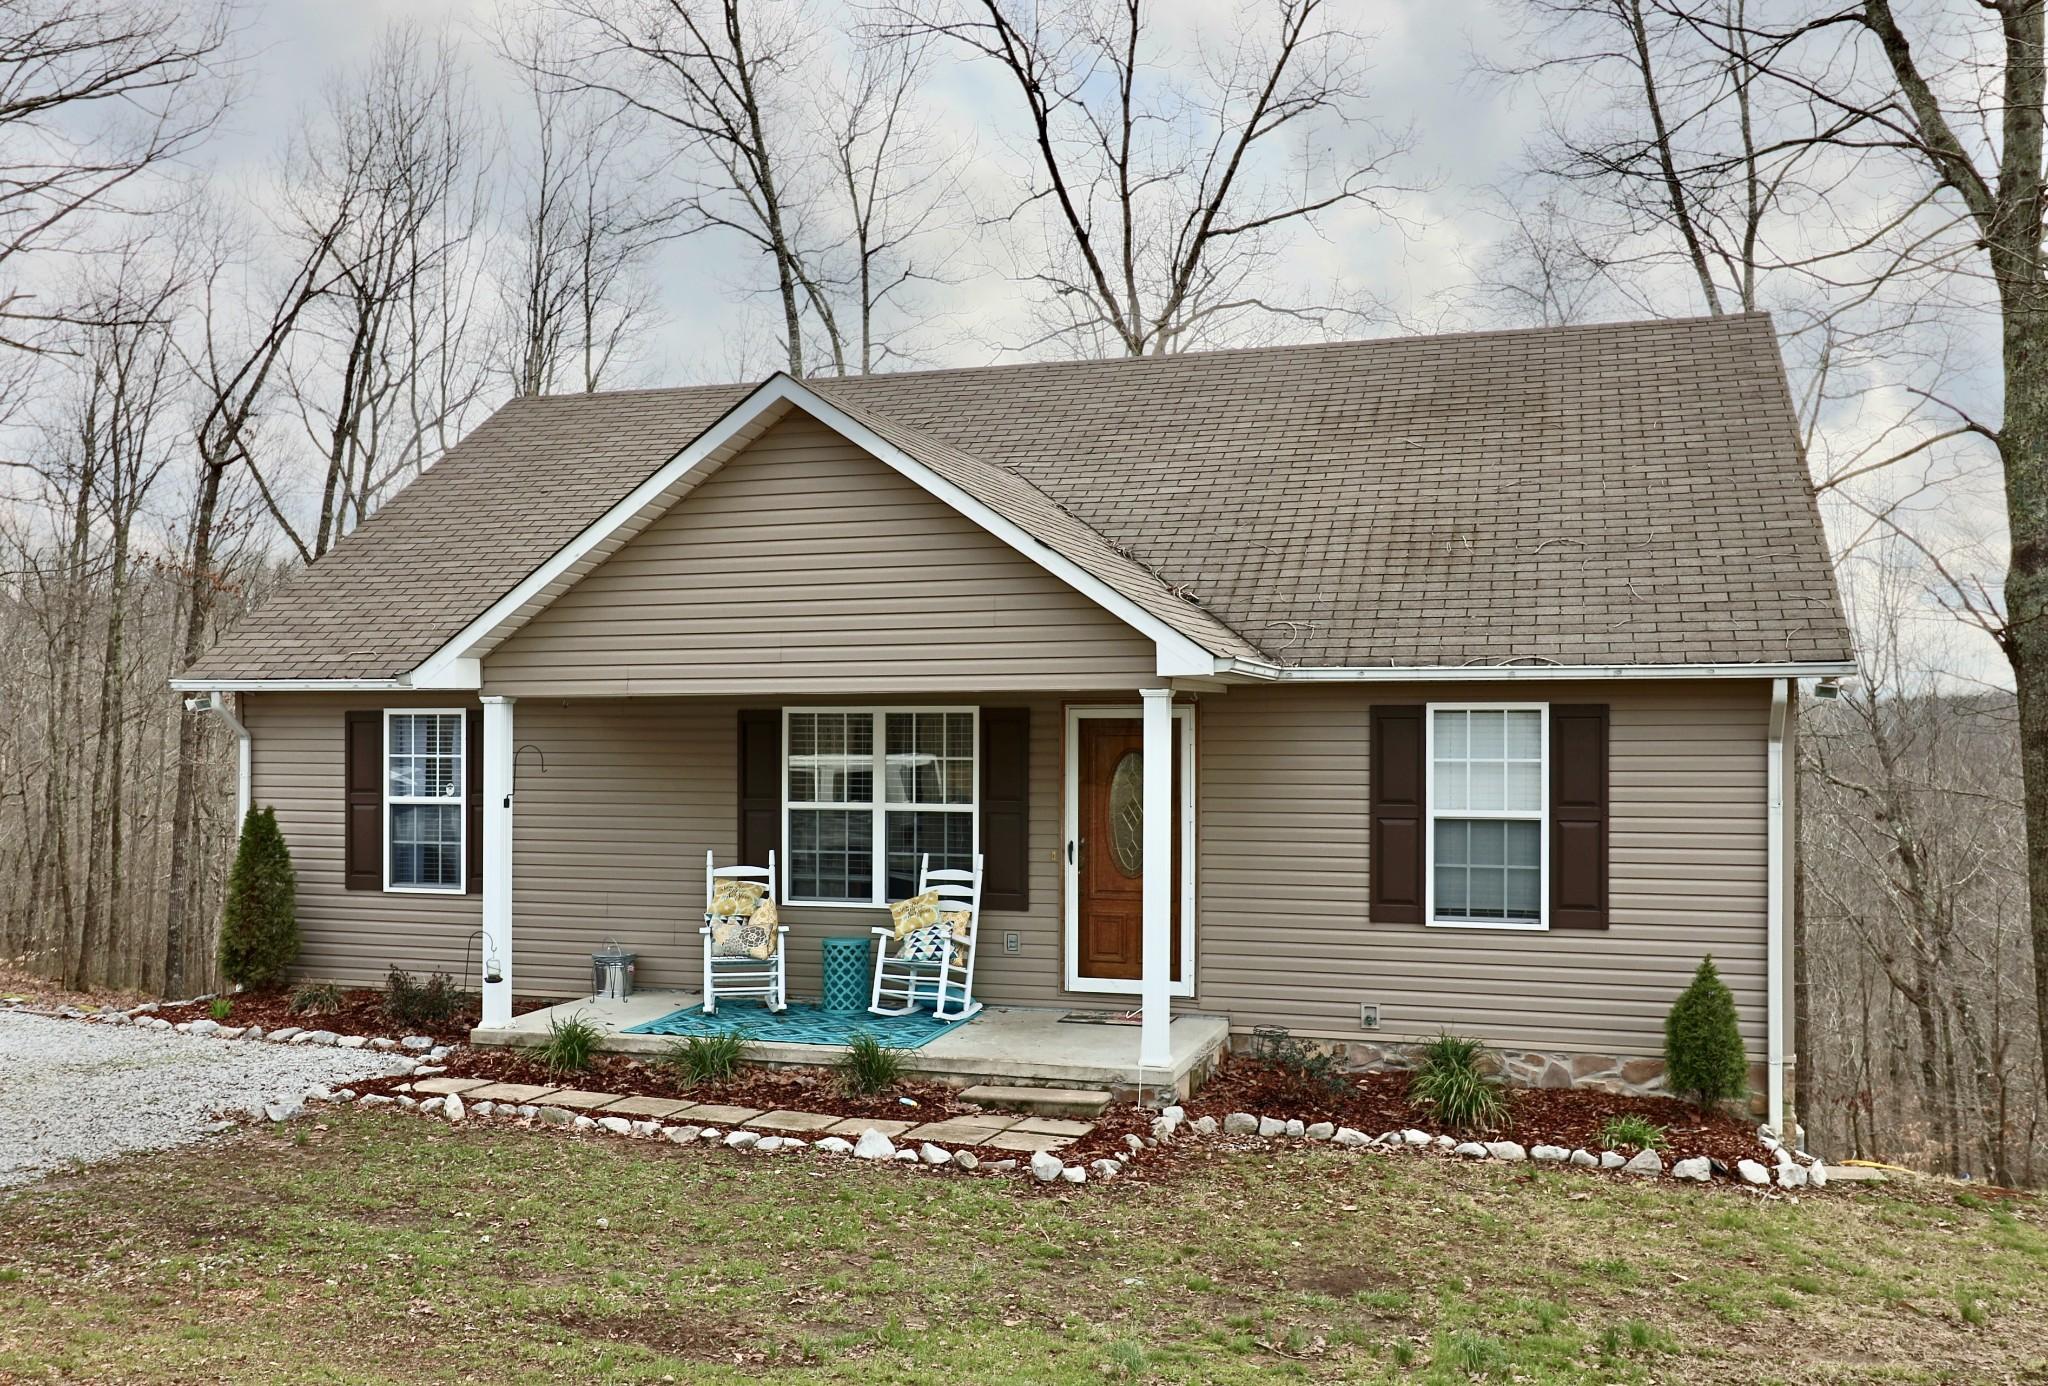 201 Deerview Ln, Leoma, TN 38468 - Leoma, TN real estate listing